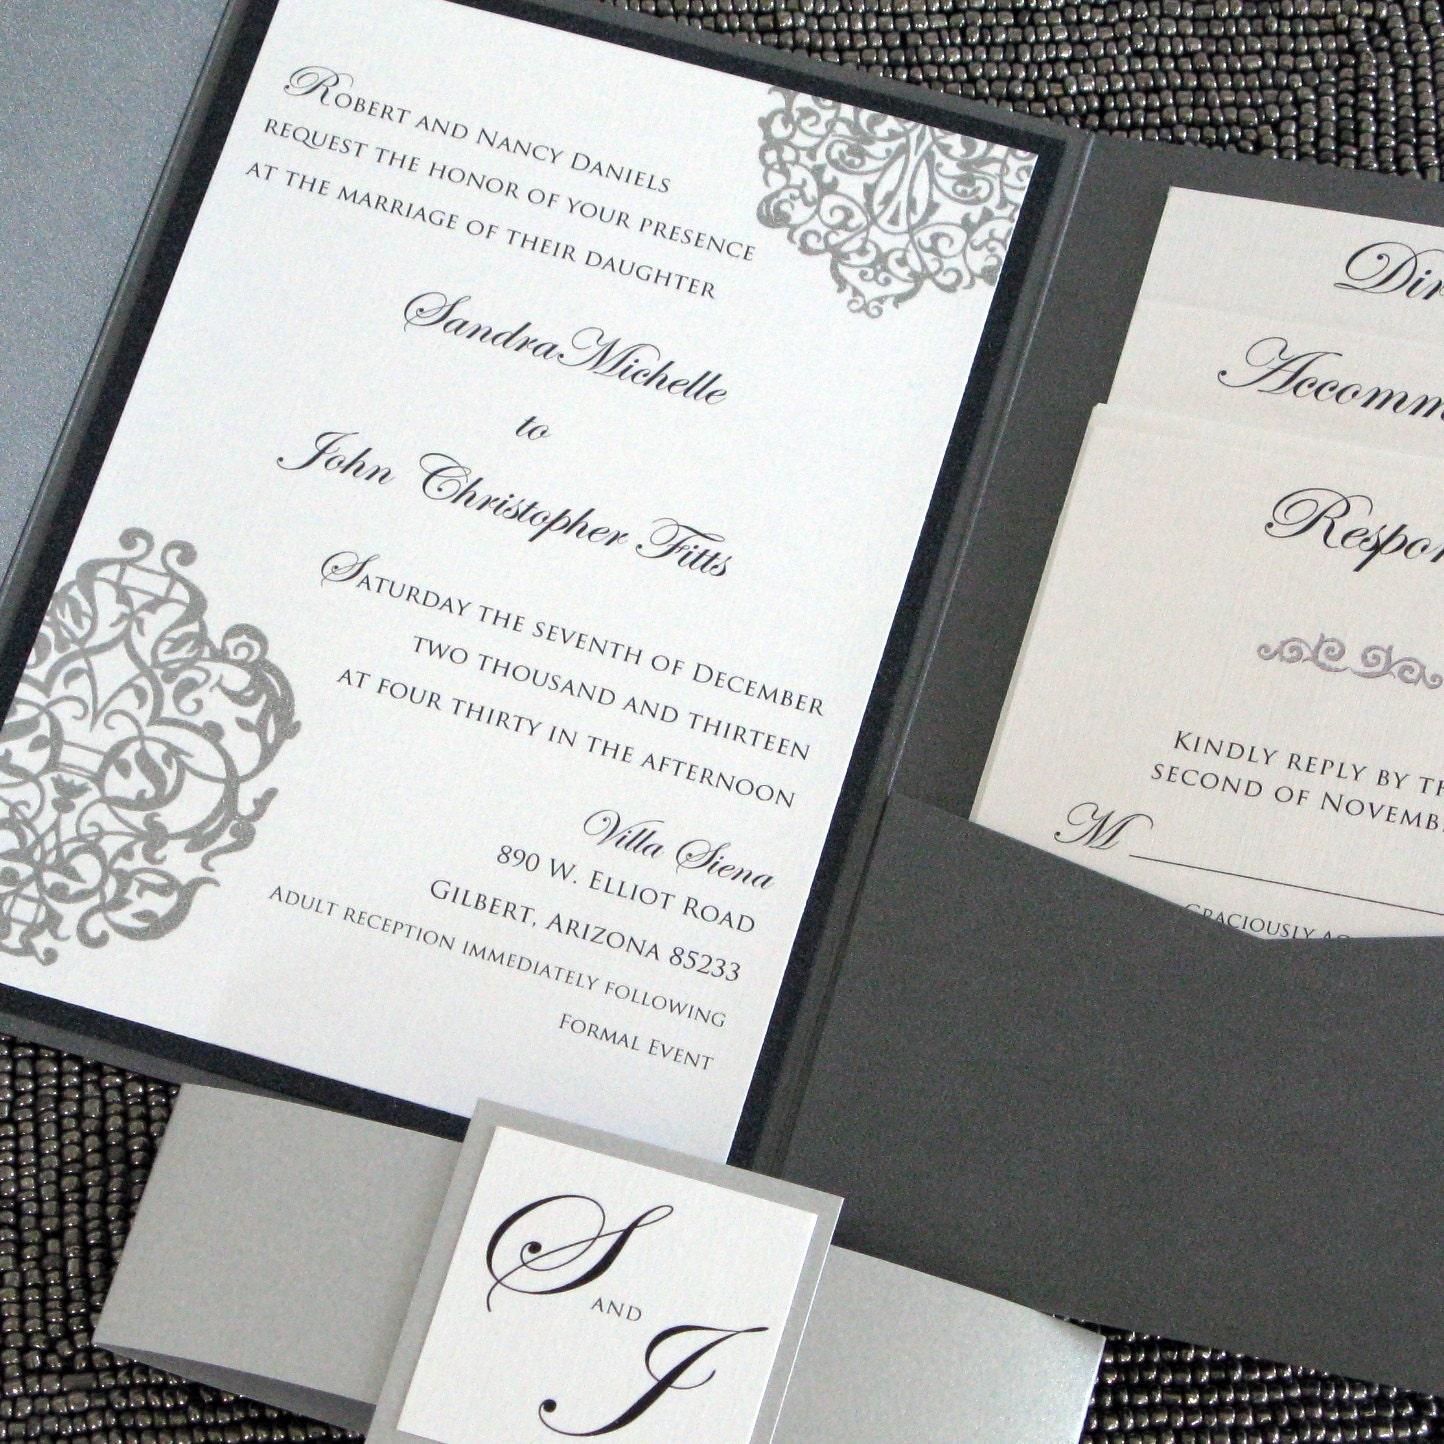 Silver Wedding Invitations: Metallic Pocketfold Wedding Invitation Black And SIlver